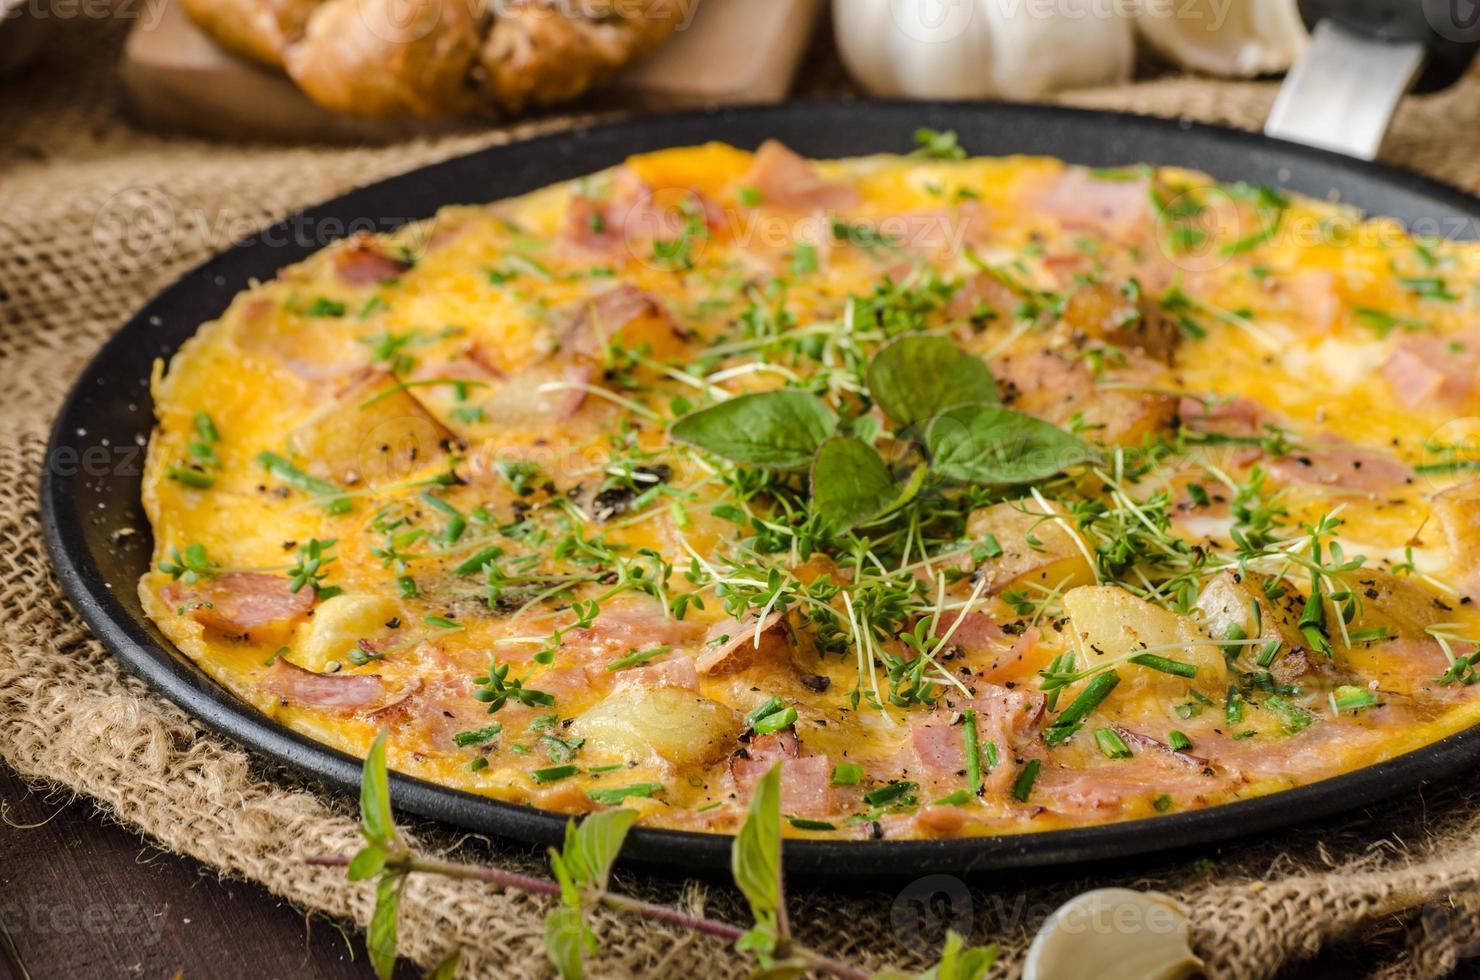 ei-omelet met ham en kruiden foto